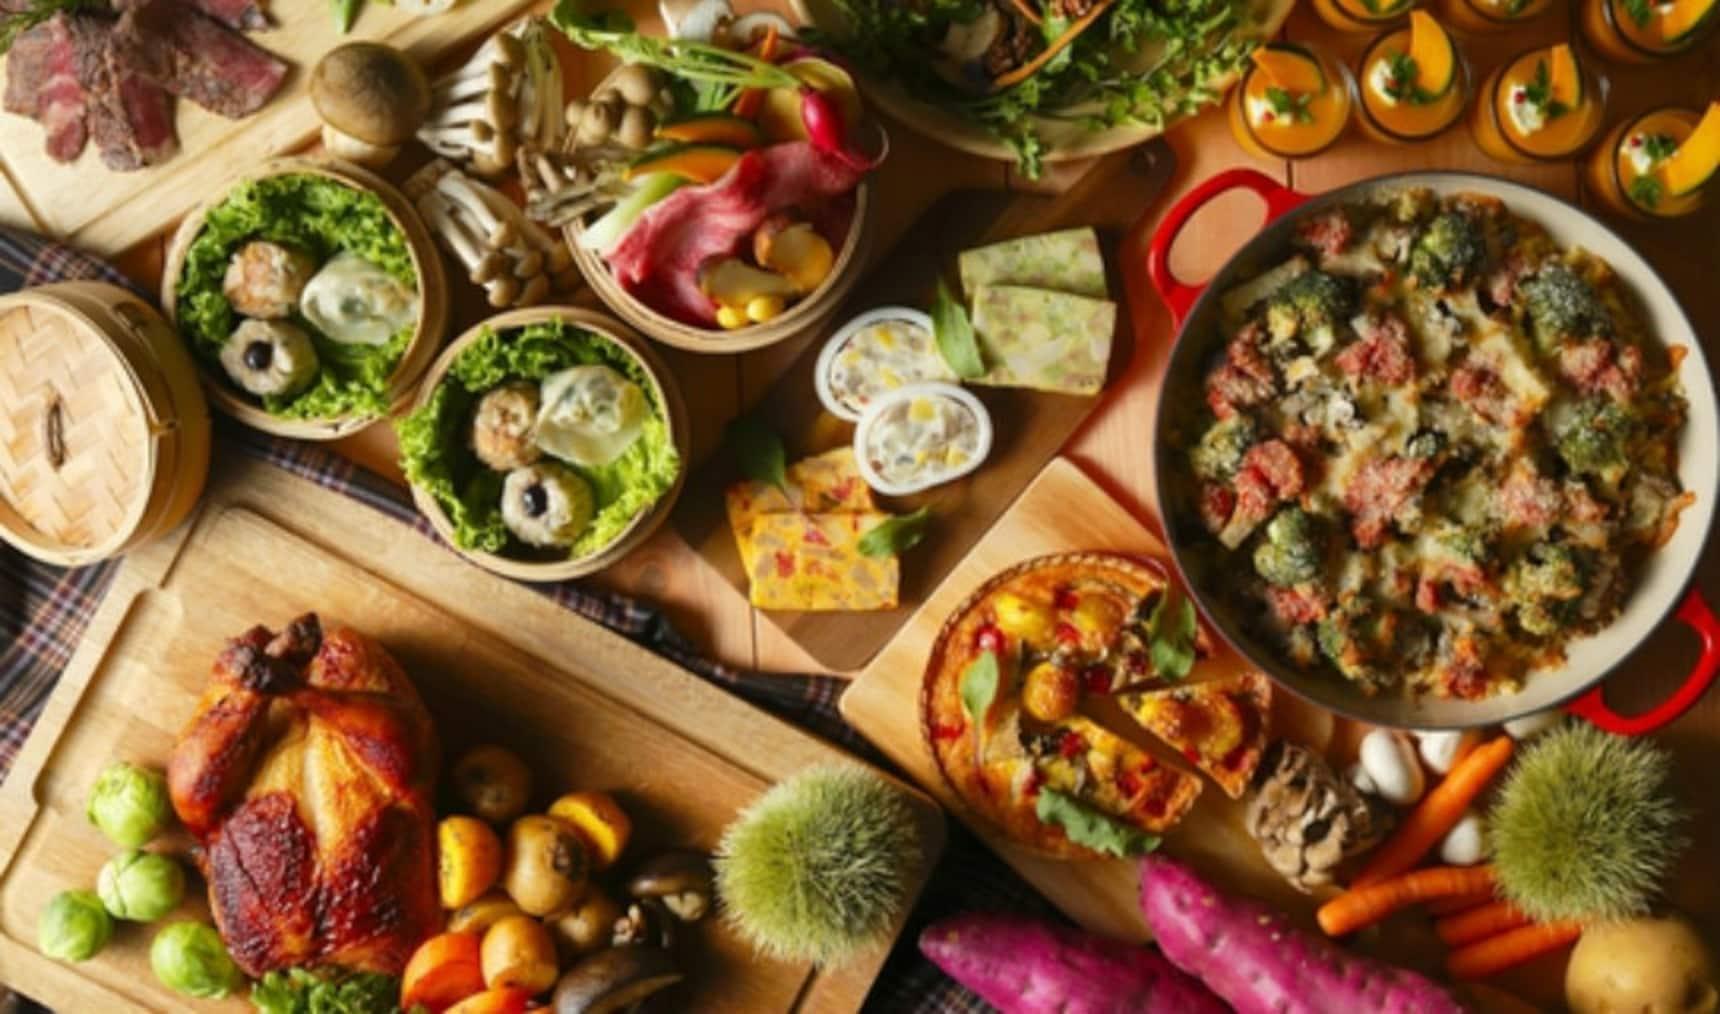 Top 5 Japanese Autumn Foods